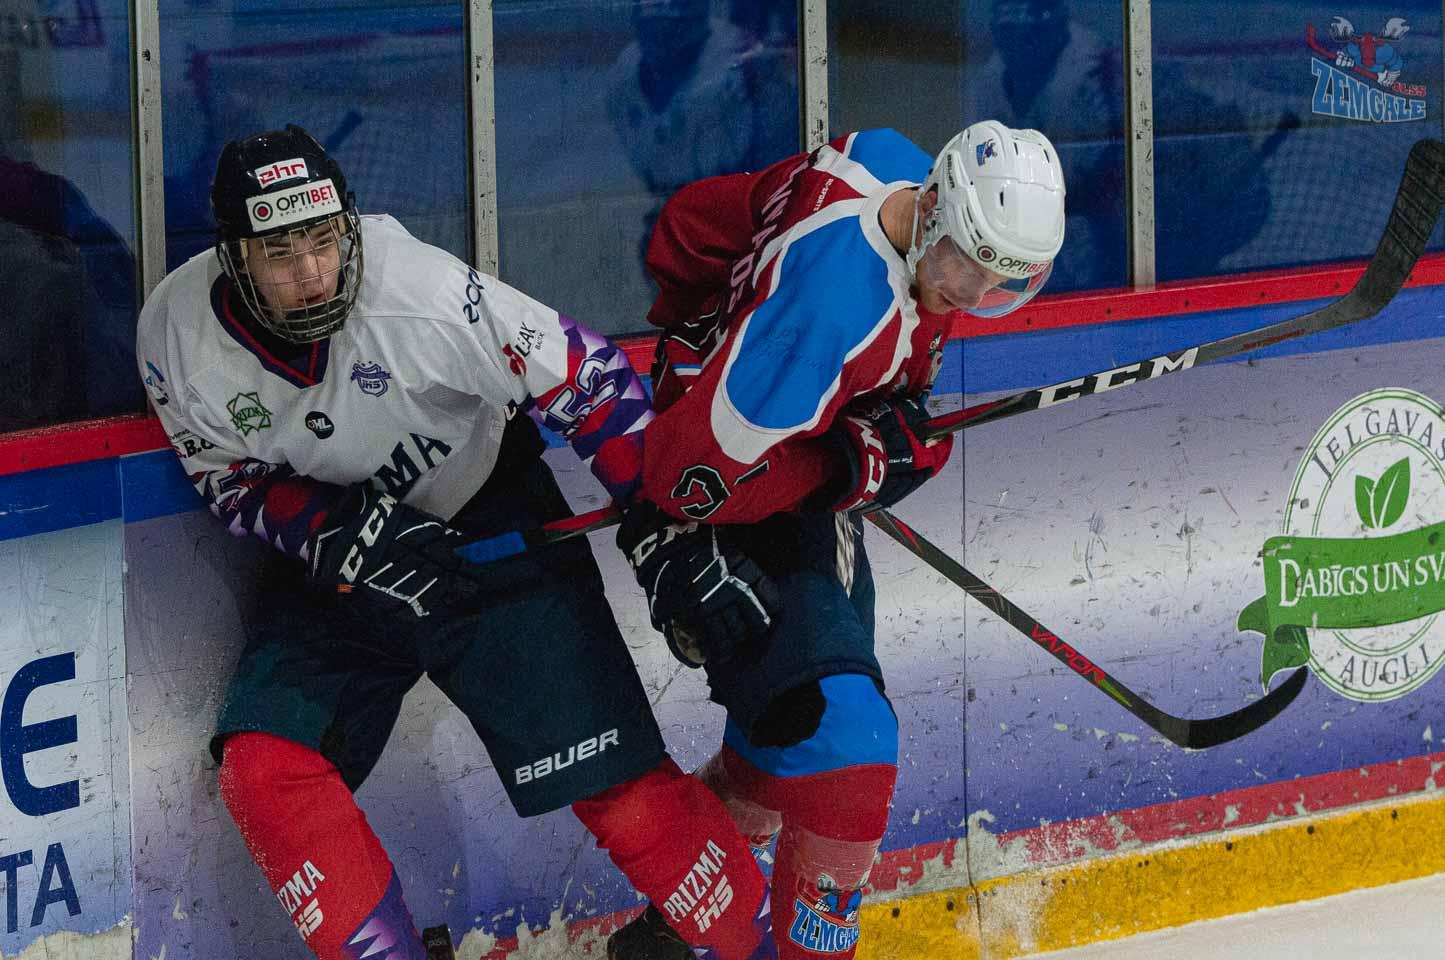 Hokejisti cīnās pie laukuma borta